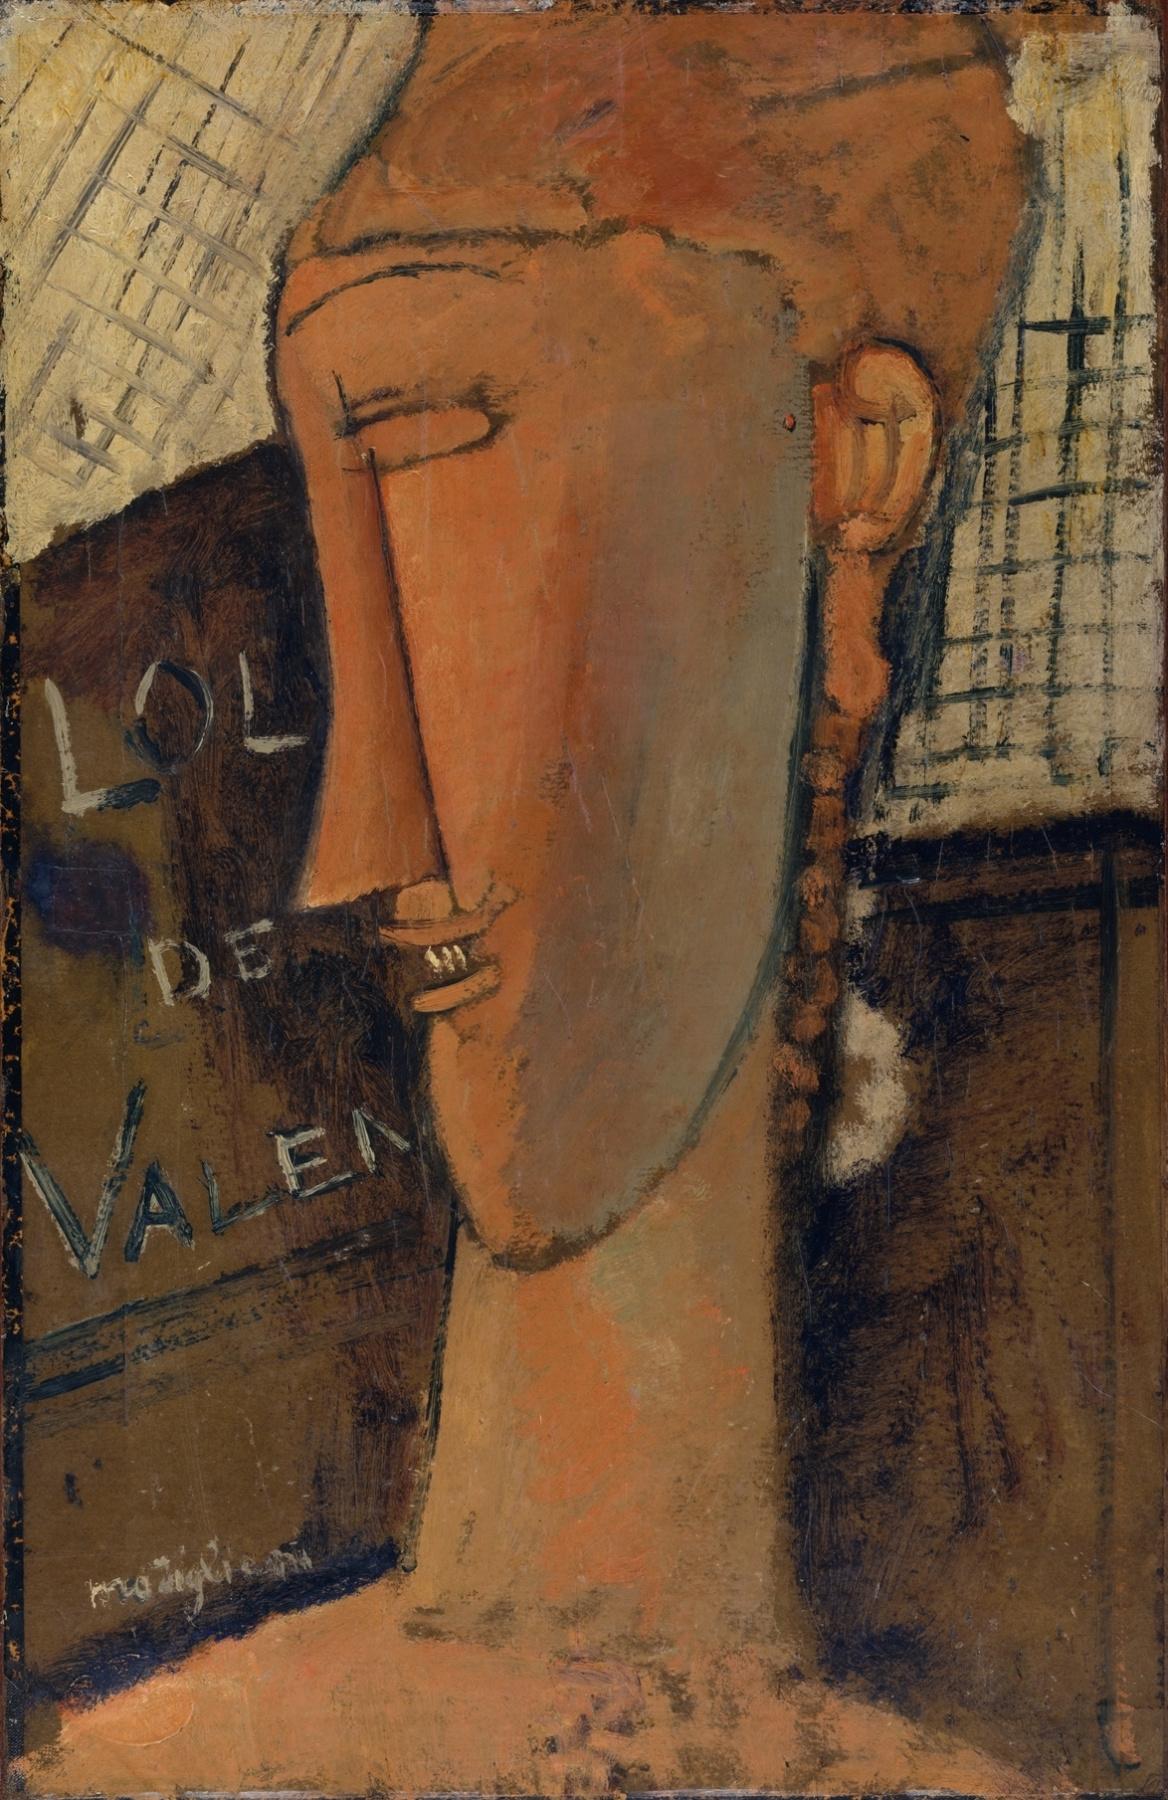 Amedeo Modigliani. Lola de valence